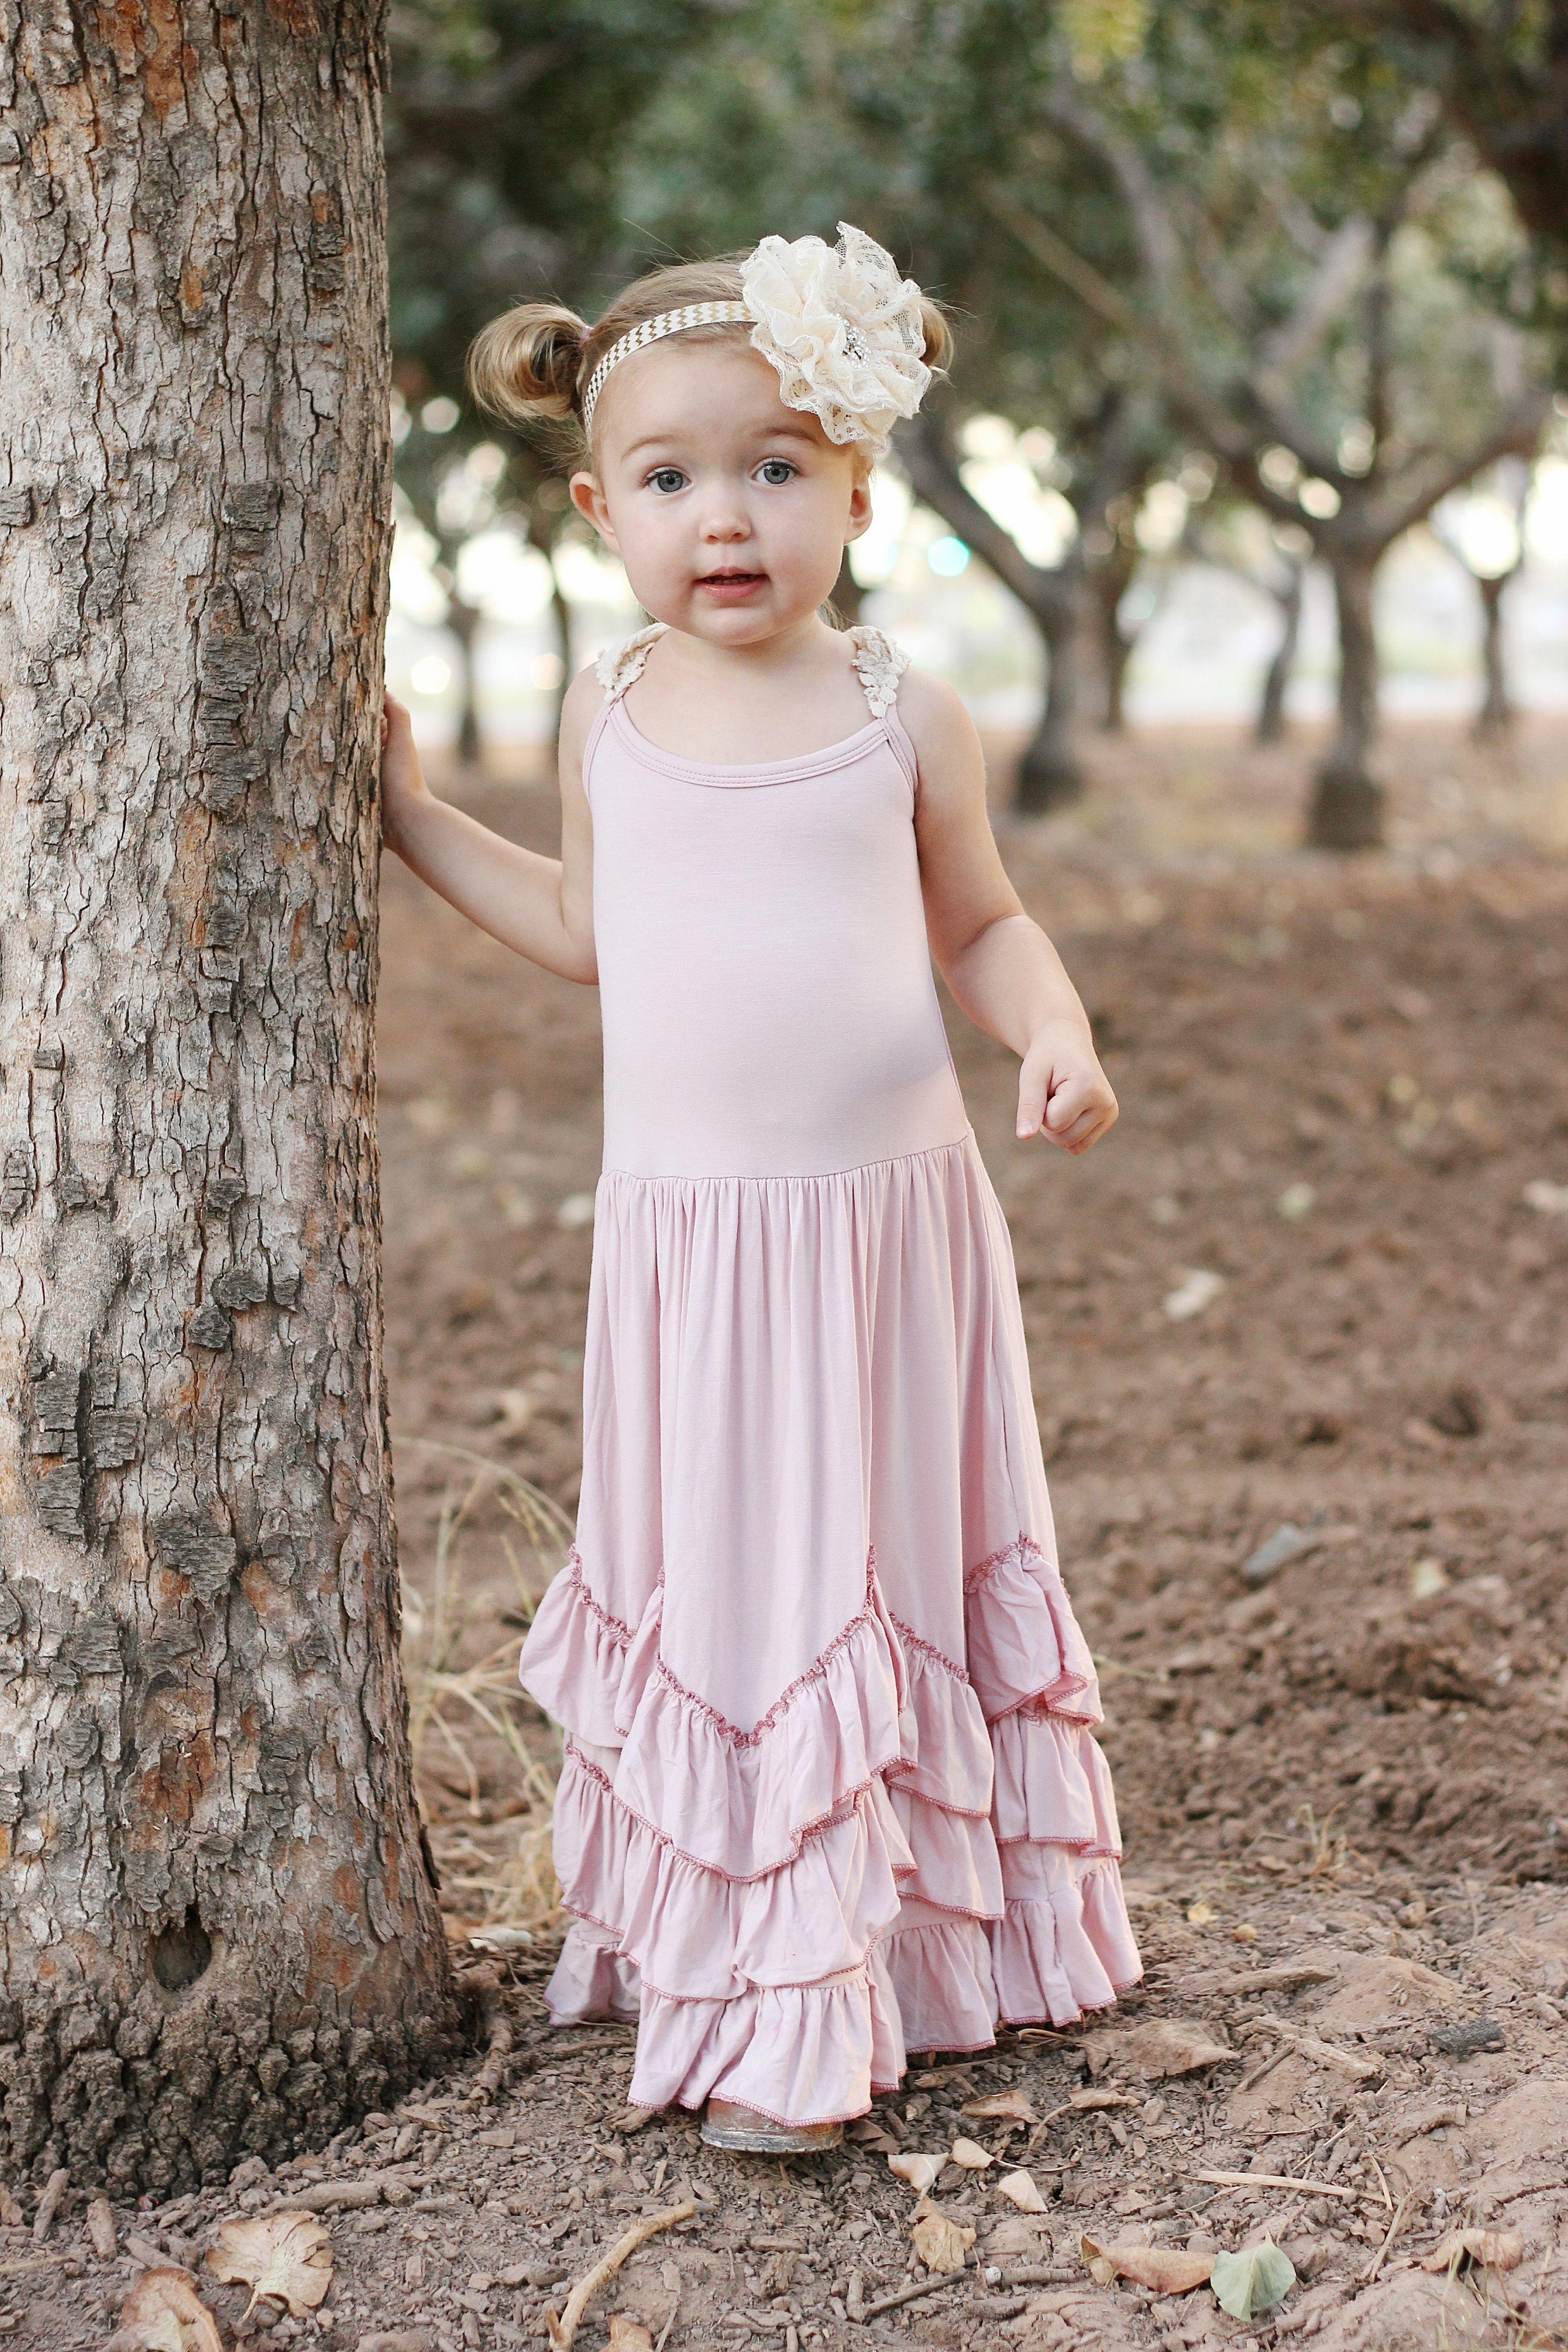 5b6d43e071333 Boho Toddler Dress - Blush Toddler Dress - Flower Girl Dress - Rustic  Flower Girl - Boho Flower Girl